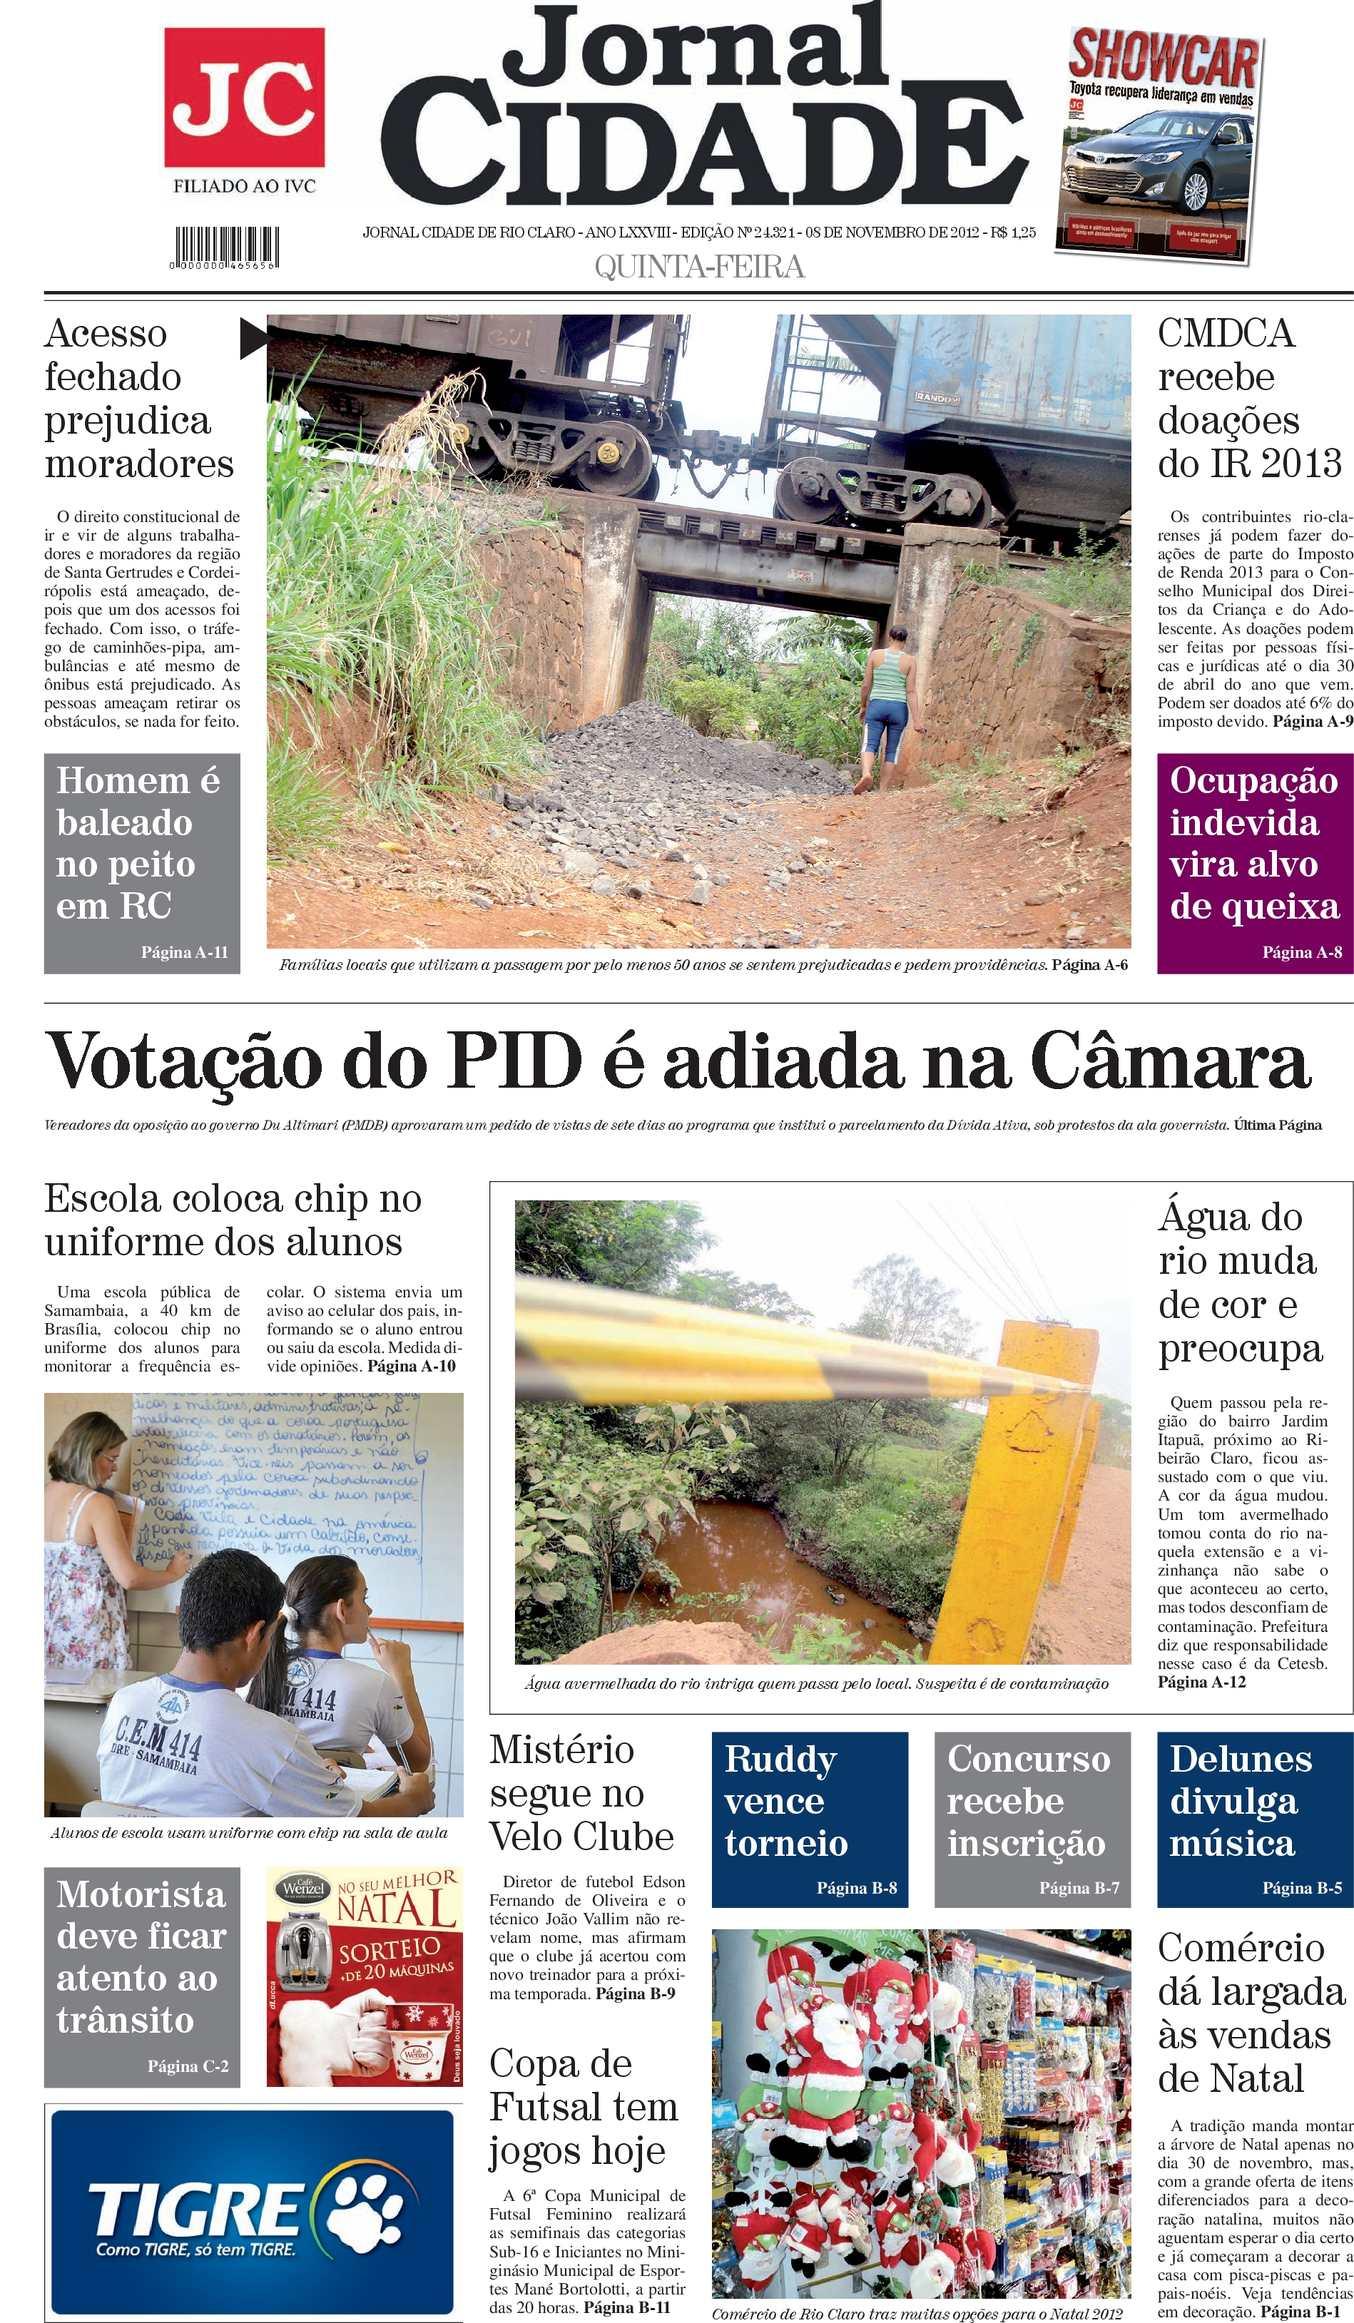 Calaméo - 08112012 8de3c4c31d031